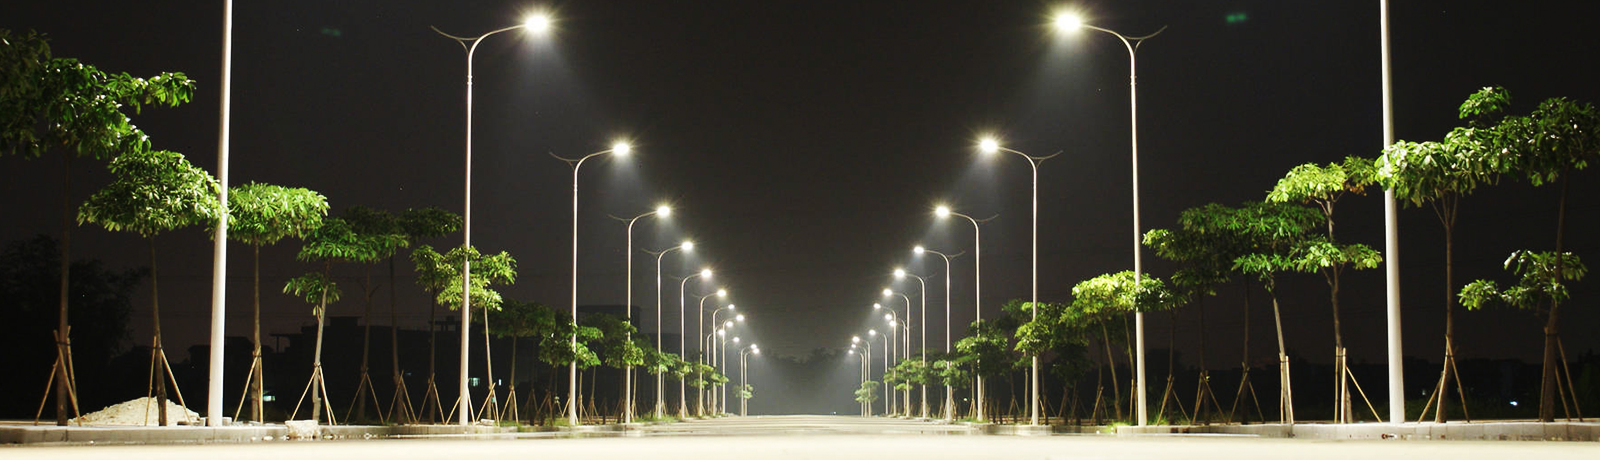 OPENBARE VERLICHTING   INDUS Lighting